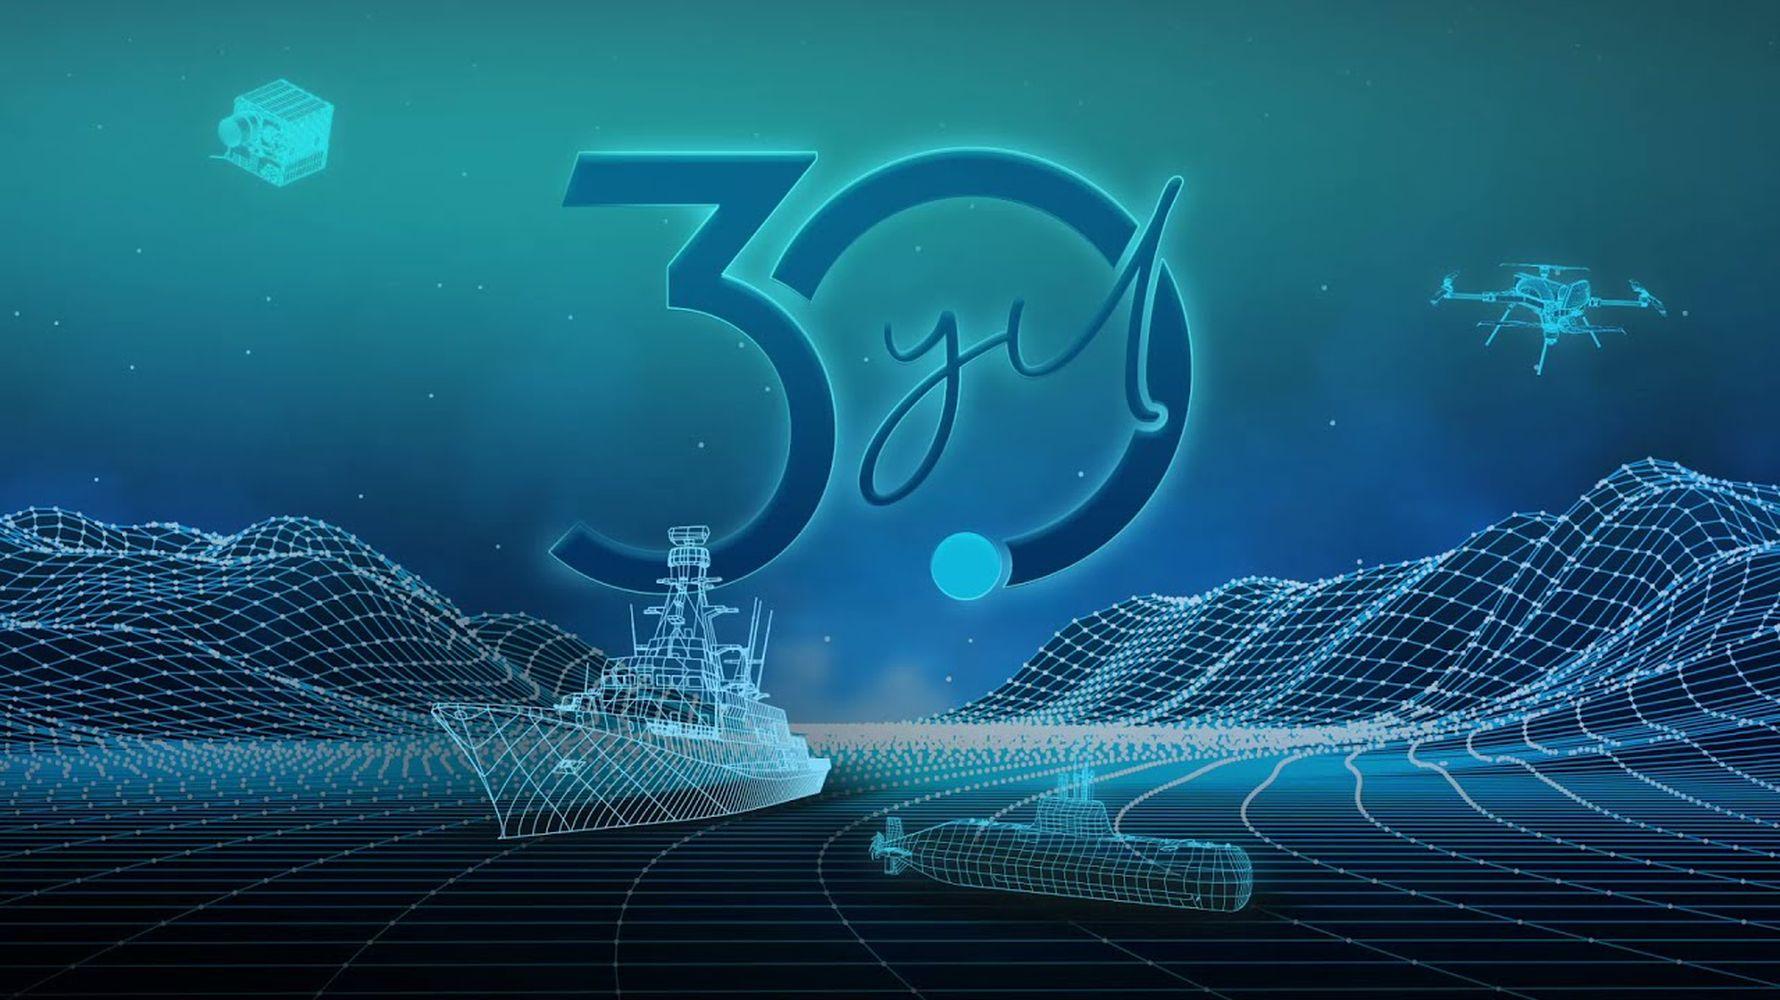 stm celebrates its anniversary